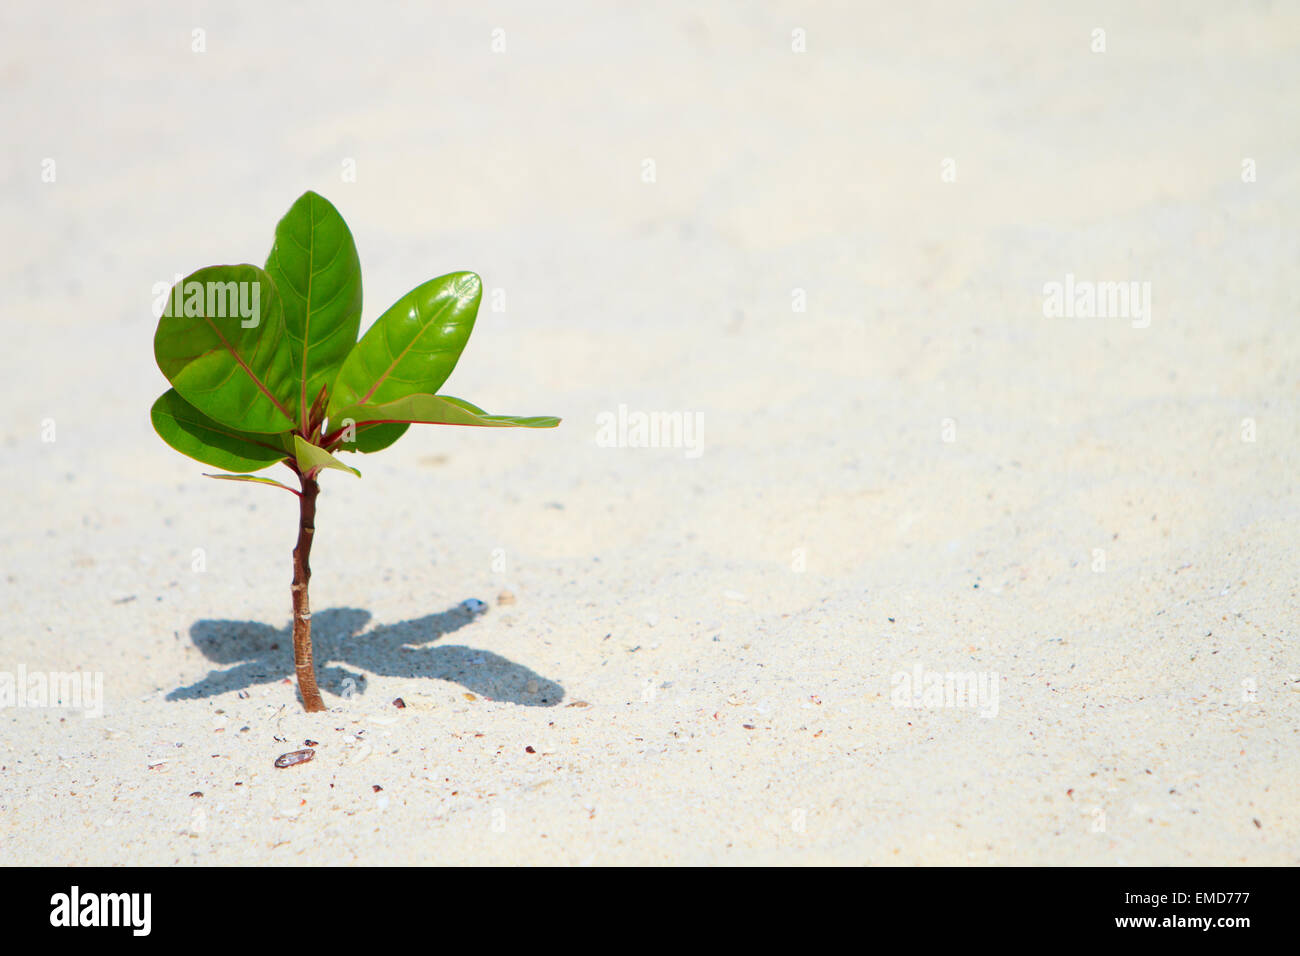 Jeune plant growing on beach Photo Stock